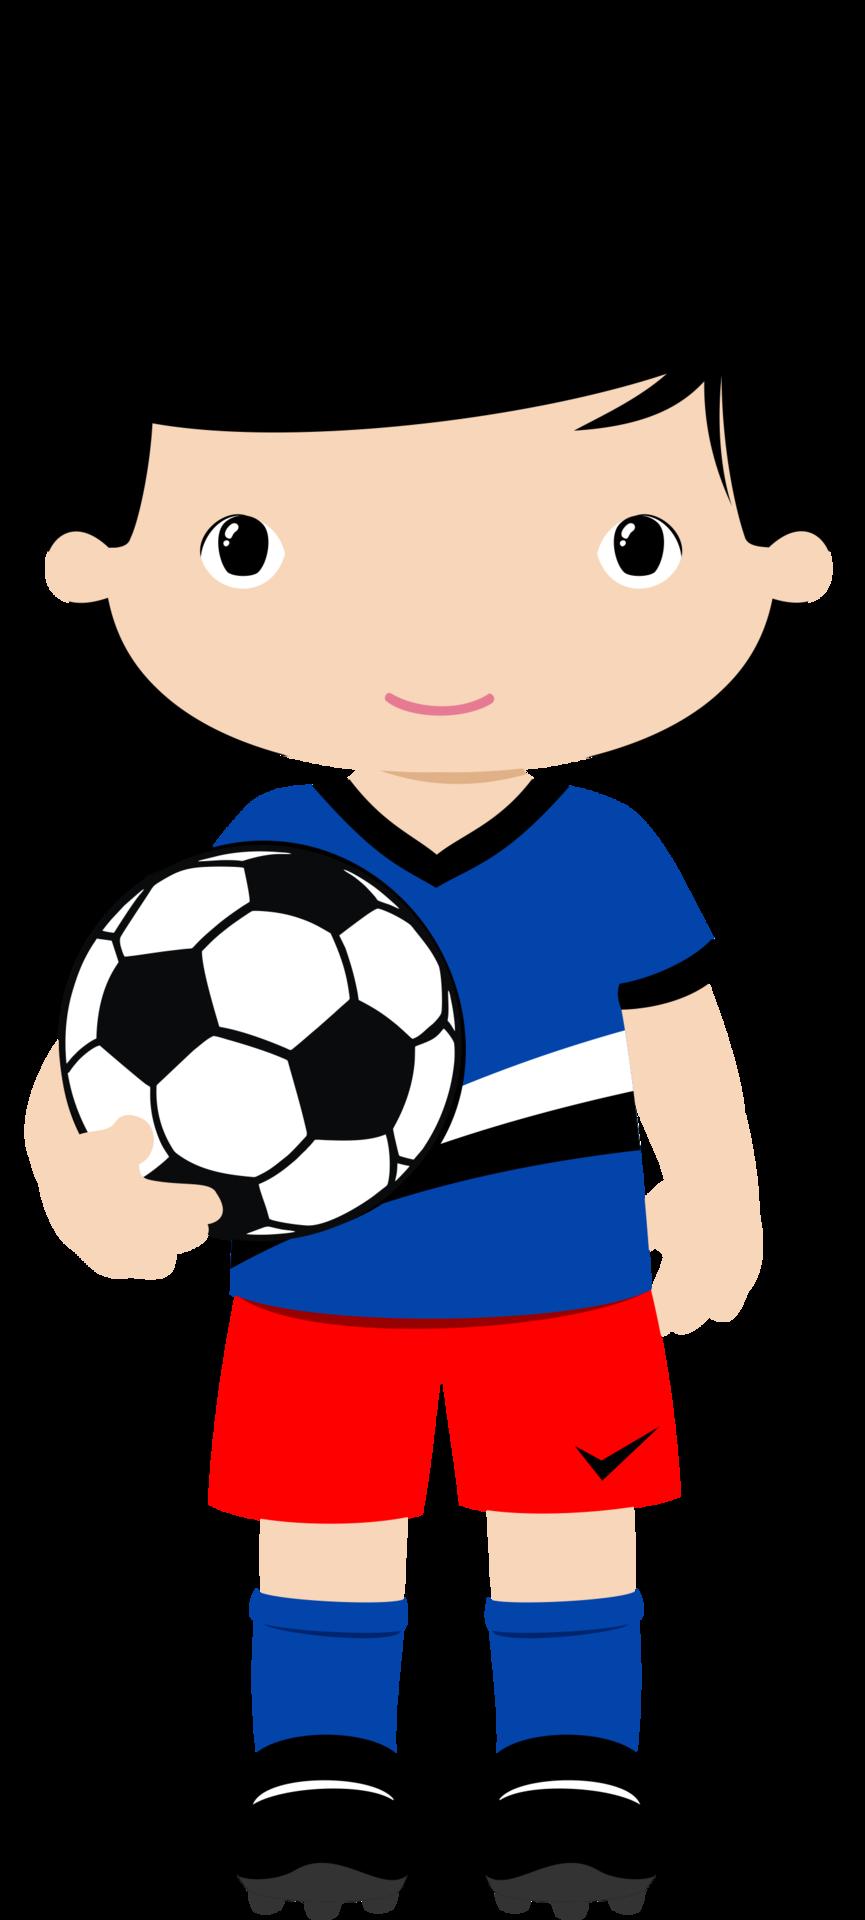 Clipart football themes png freeuse 4shared - Ver todas las imágenes de la carpeta PNG | Cards ... png freeuse